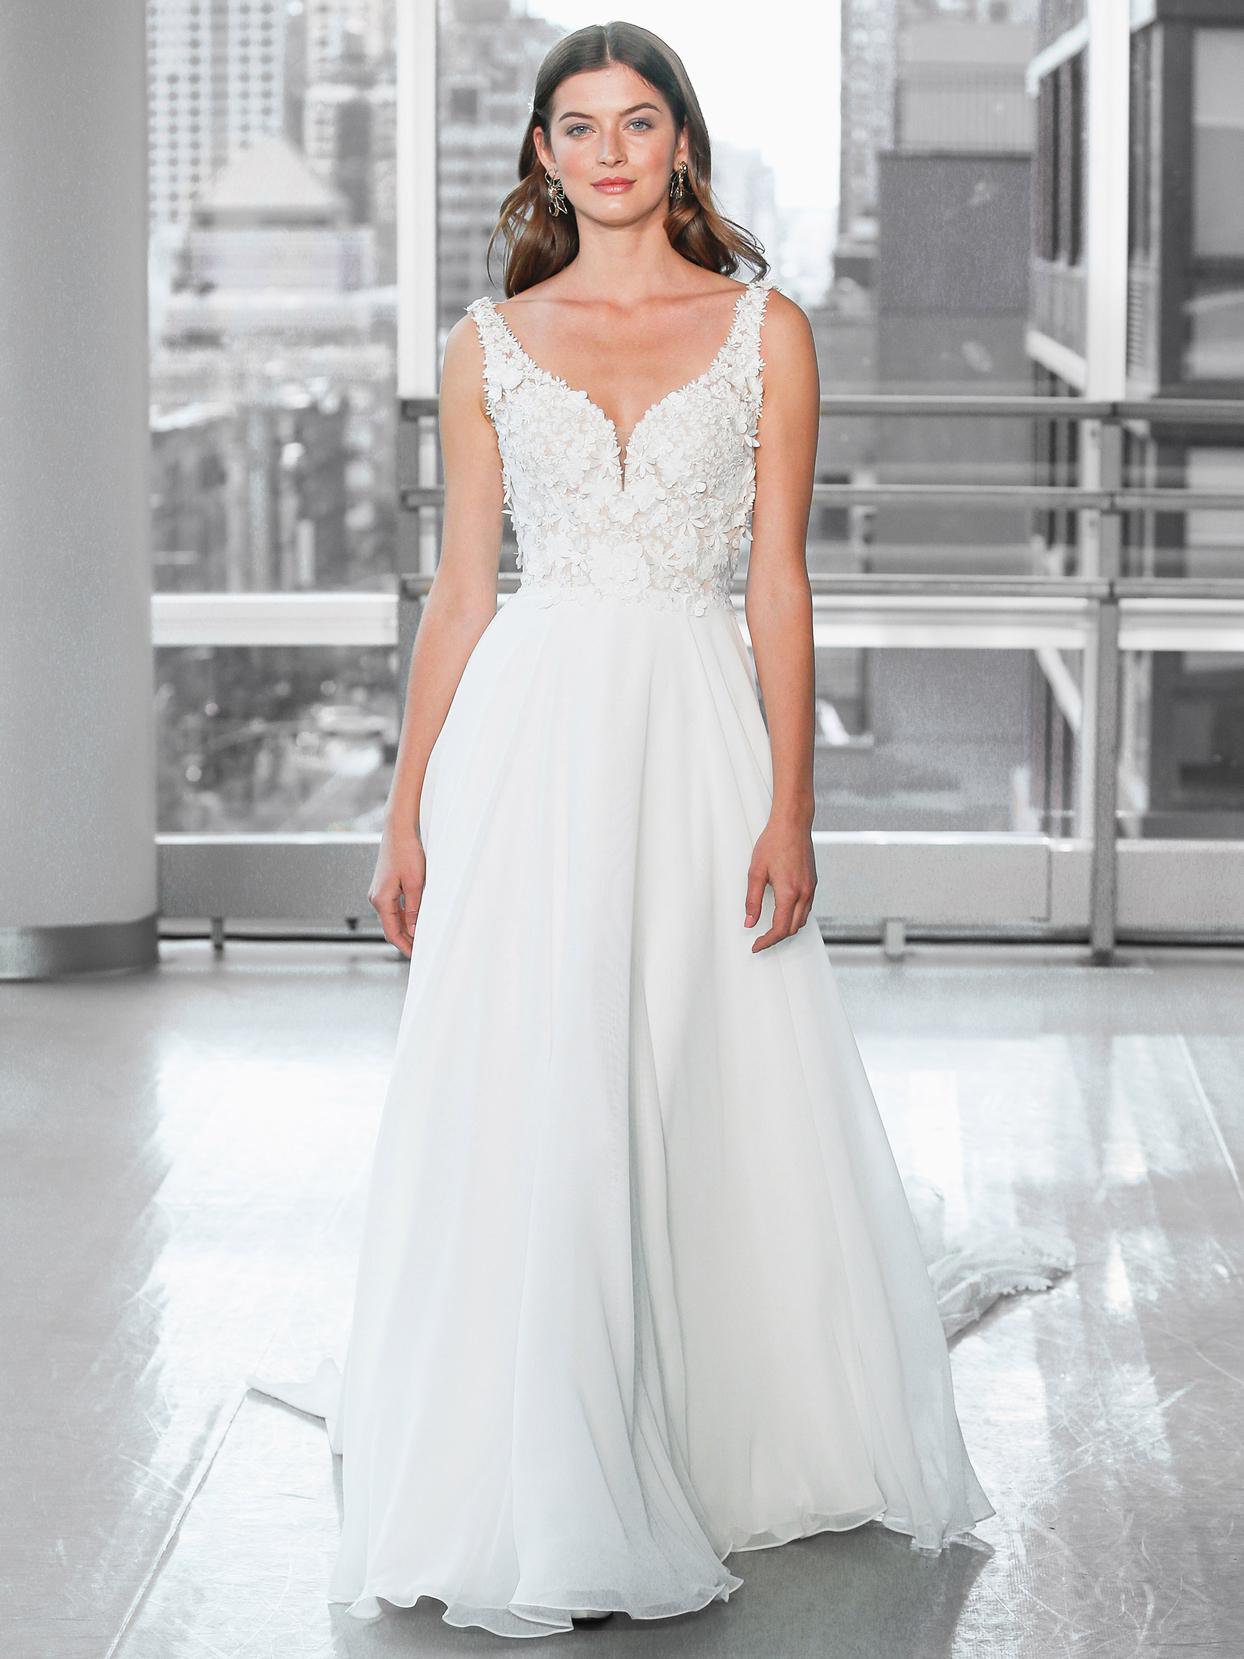 Justin Alexander Signature chiffon a-line 3d floral applique wedding dress fall 2020